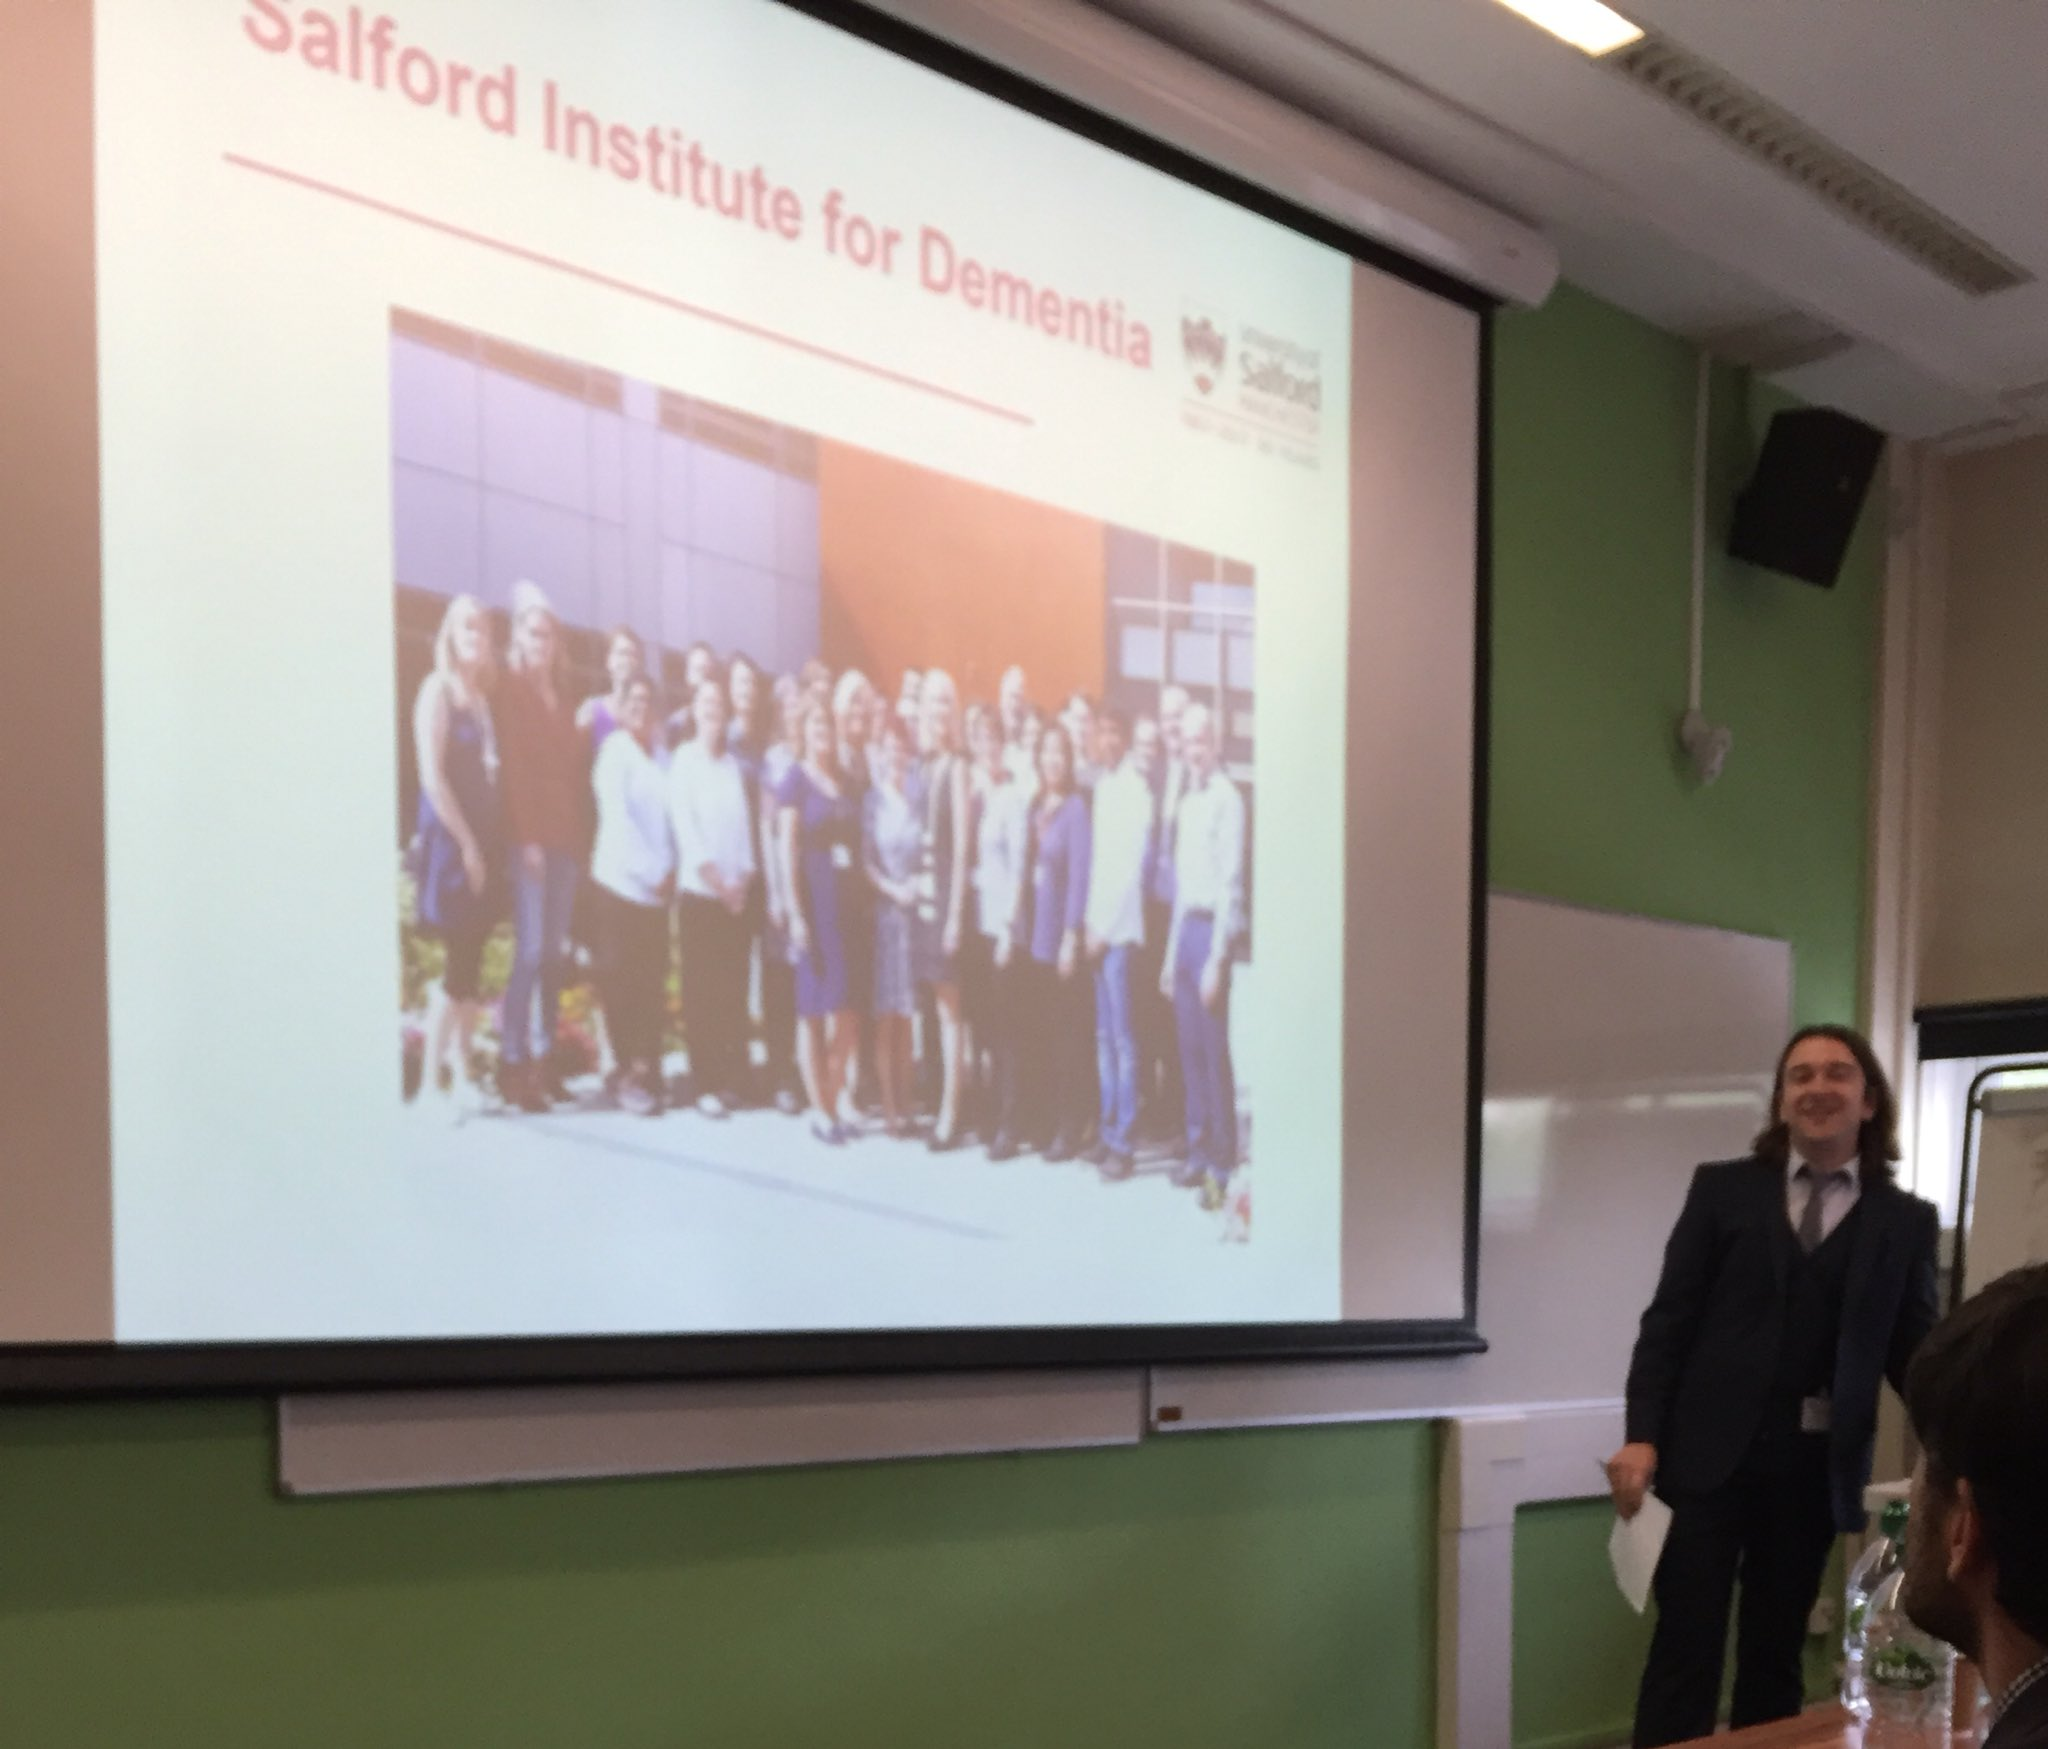 Dr Andrew Clark introduces @InstforDementia https://t.co/TjaCqGTQZt